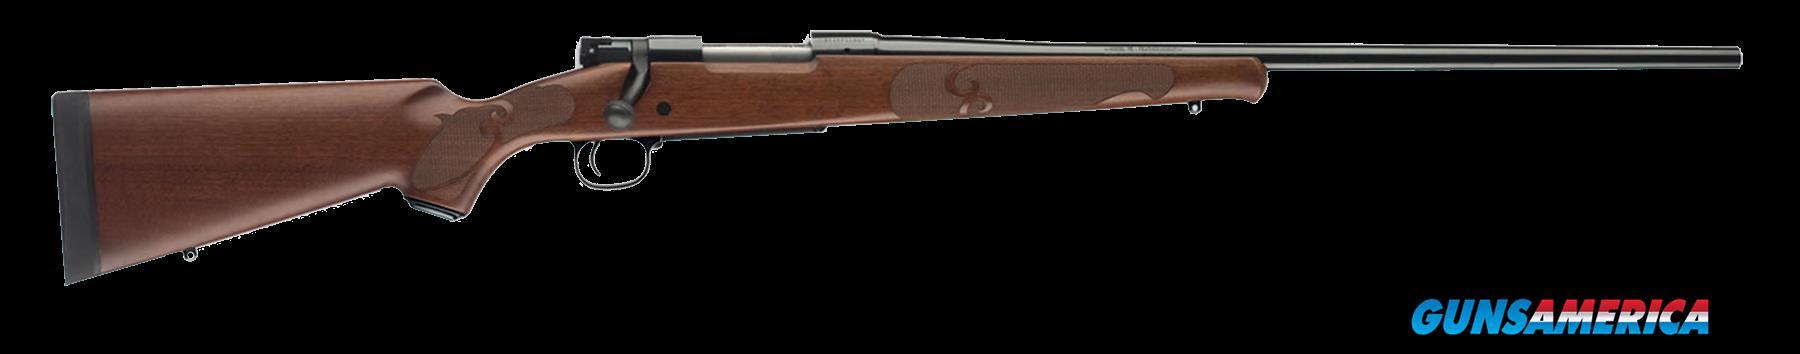 Winchester Guns 70, Wgun 535200228 M70 Fwt      3006  Guns > Pistols > 1911 Pistol Copies (non-Colt)